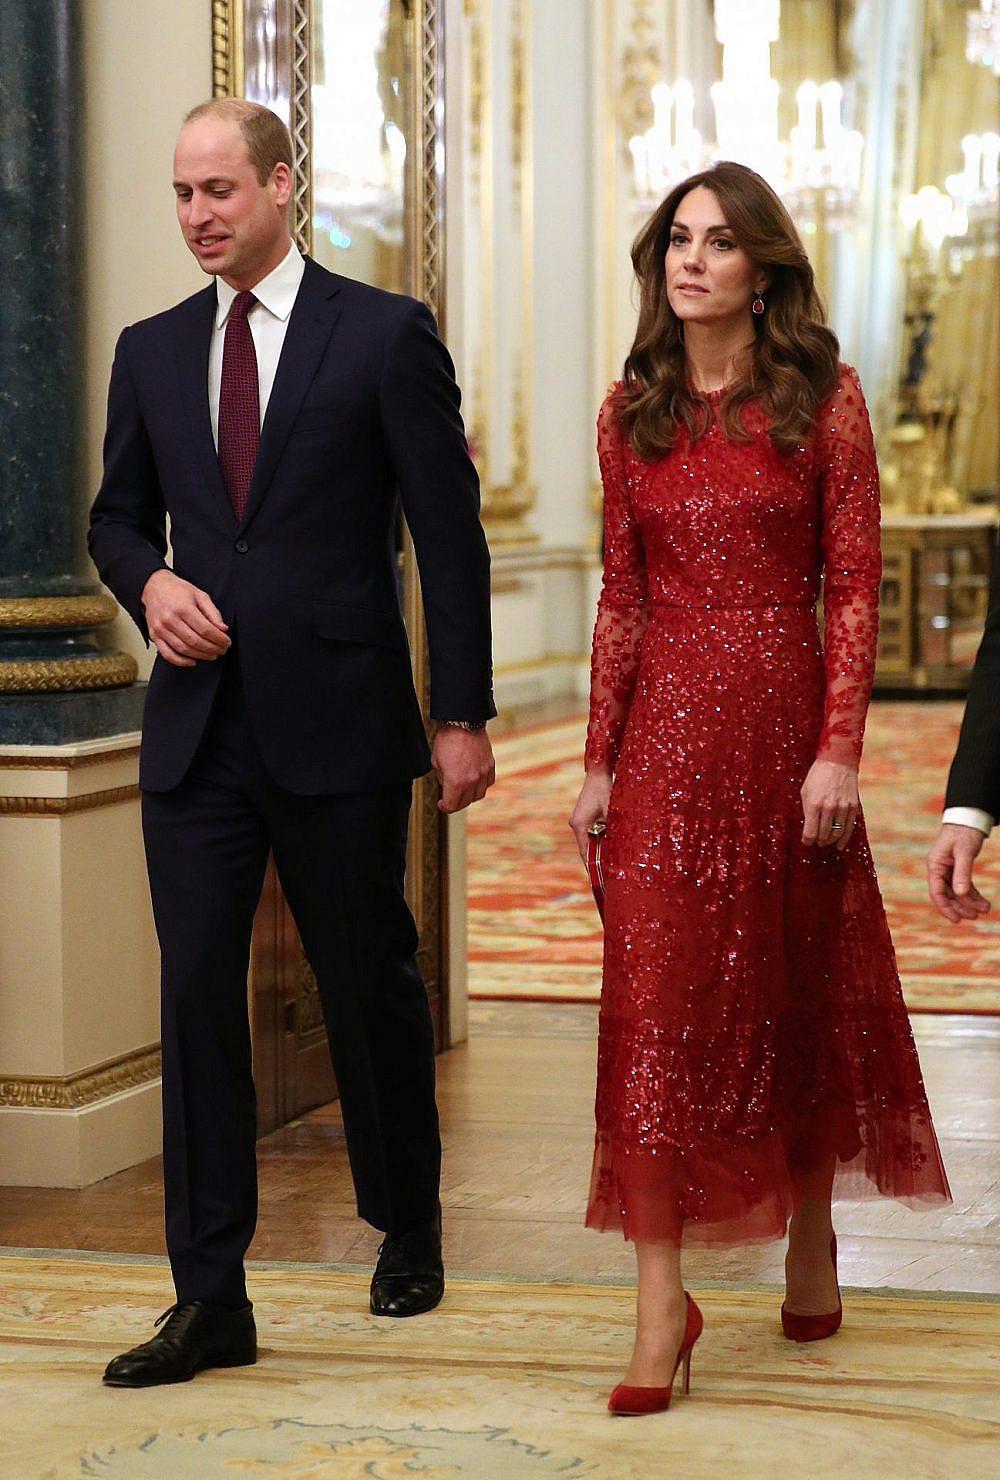 קייט מידלטון והנסיך וויליאם | צילום: Yui Mok – WPA Pool/Getty Images